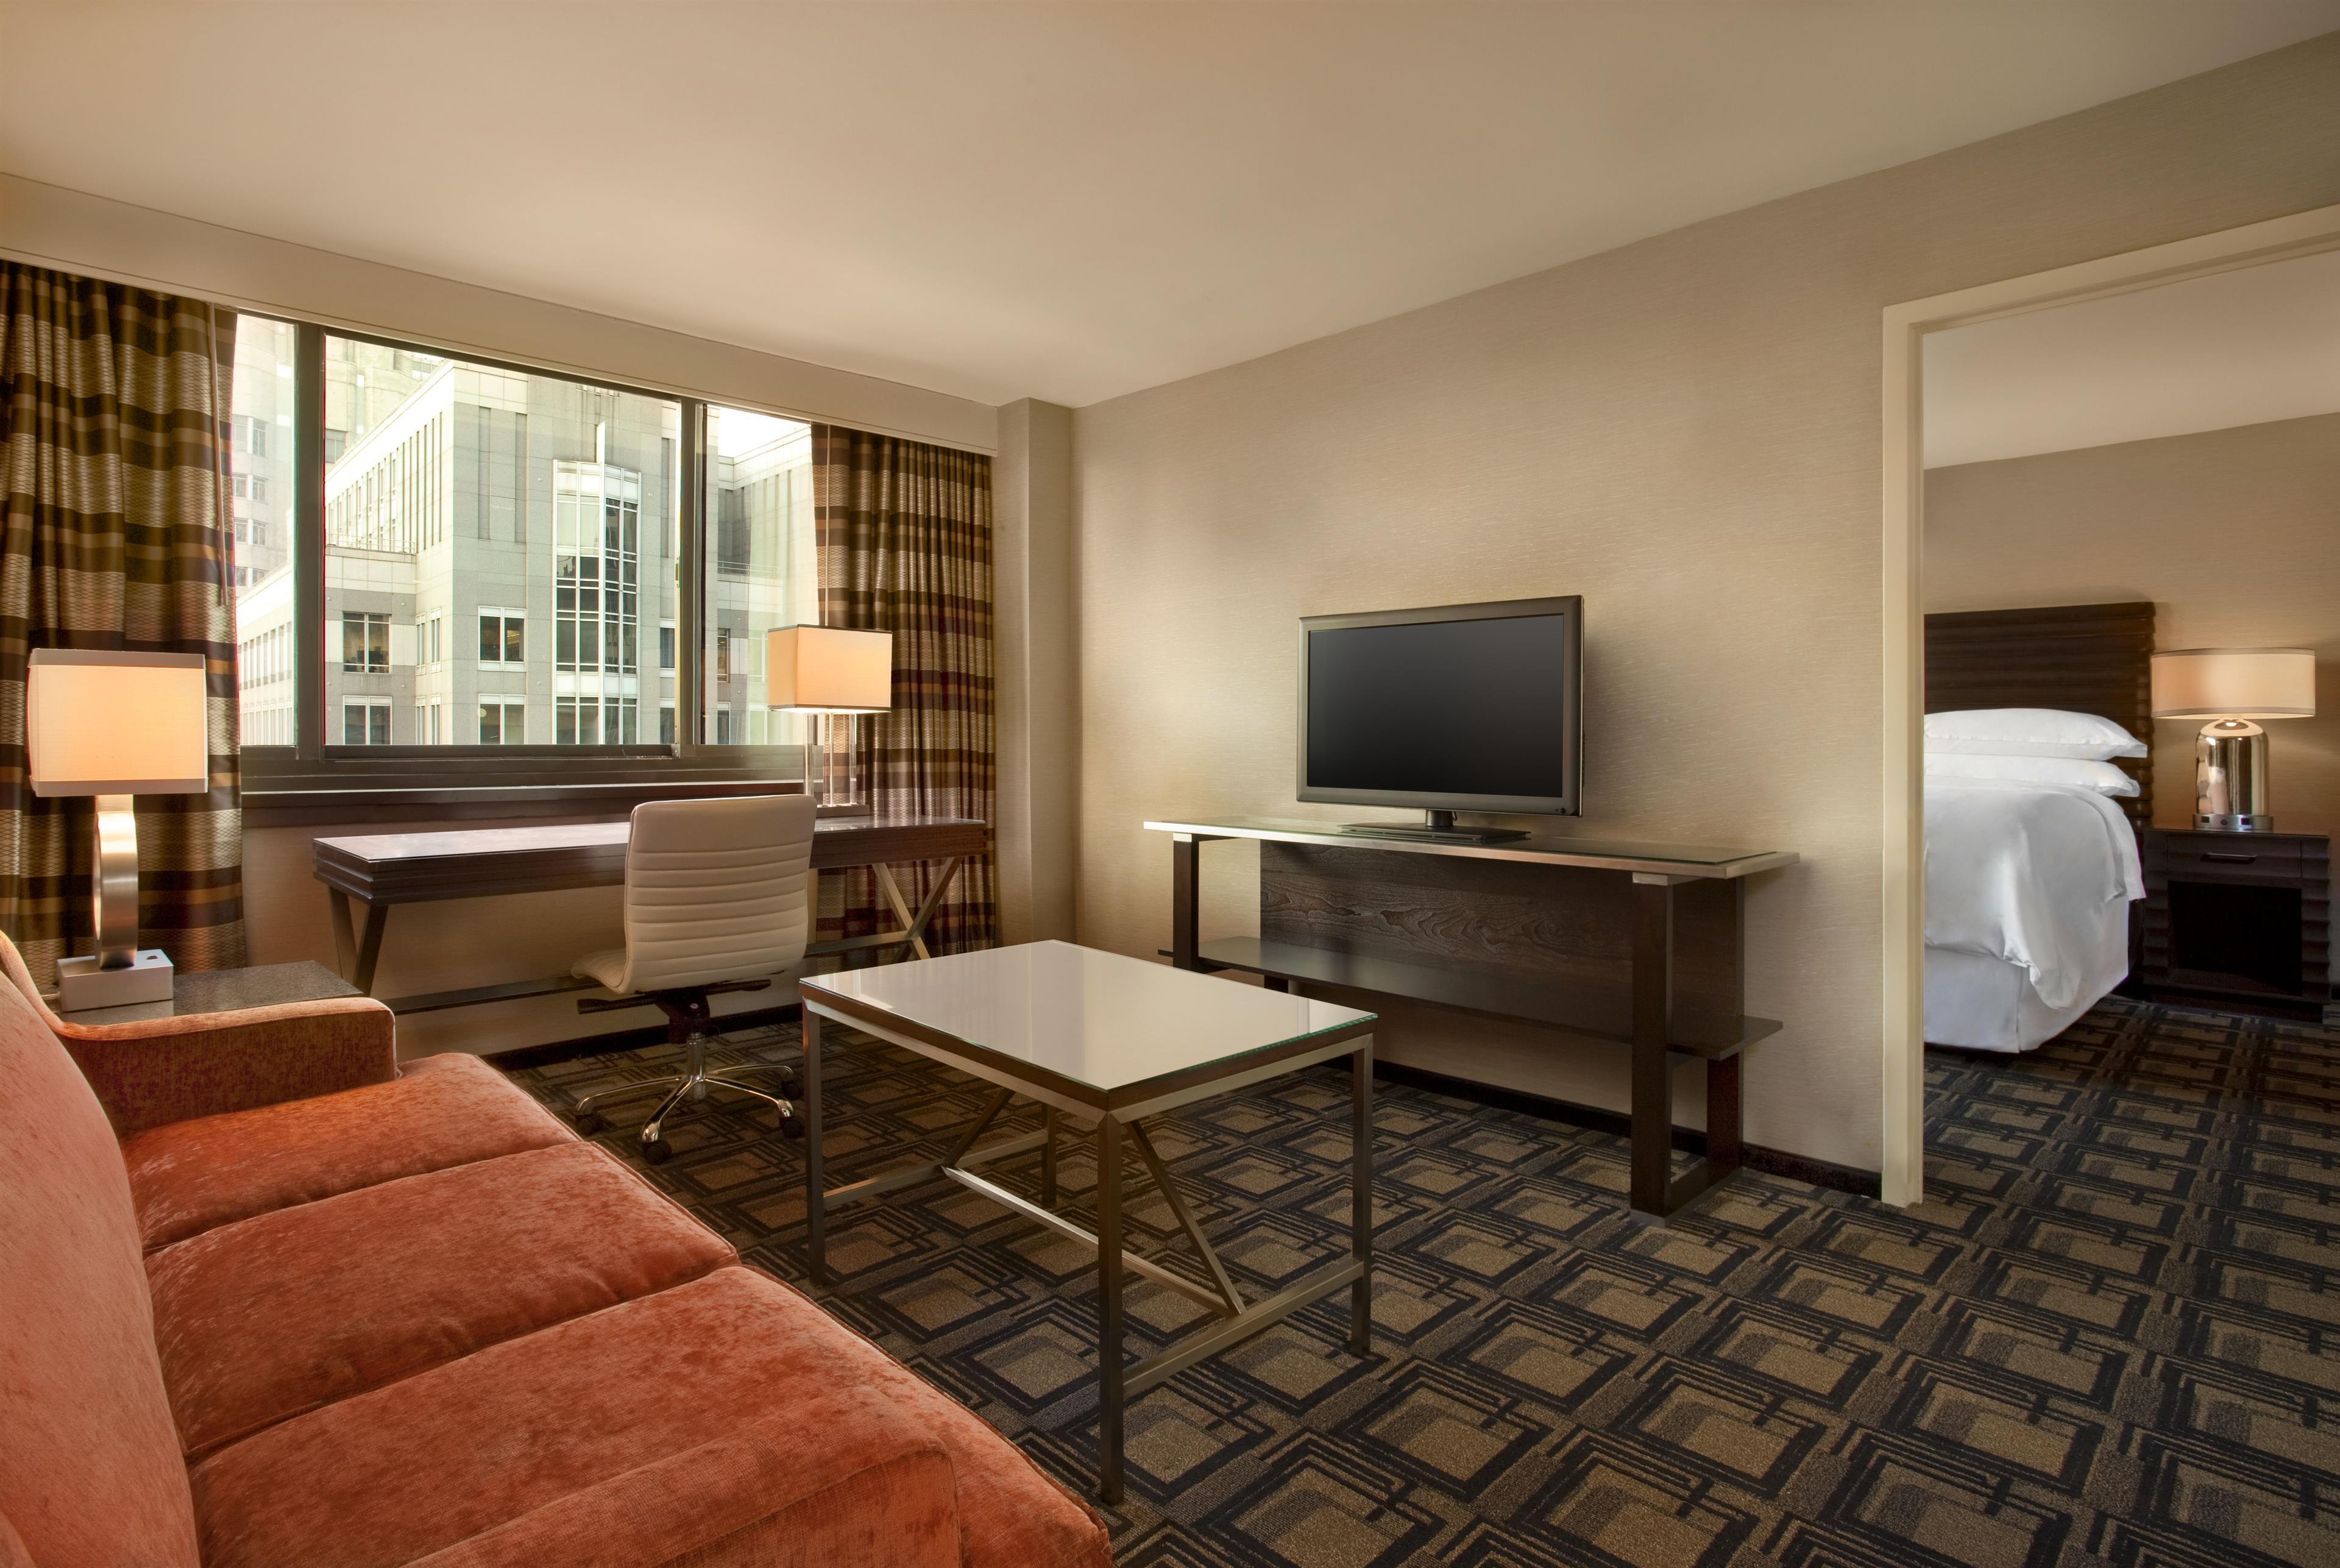 Sheraton New York Times Square Hotel image 6